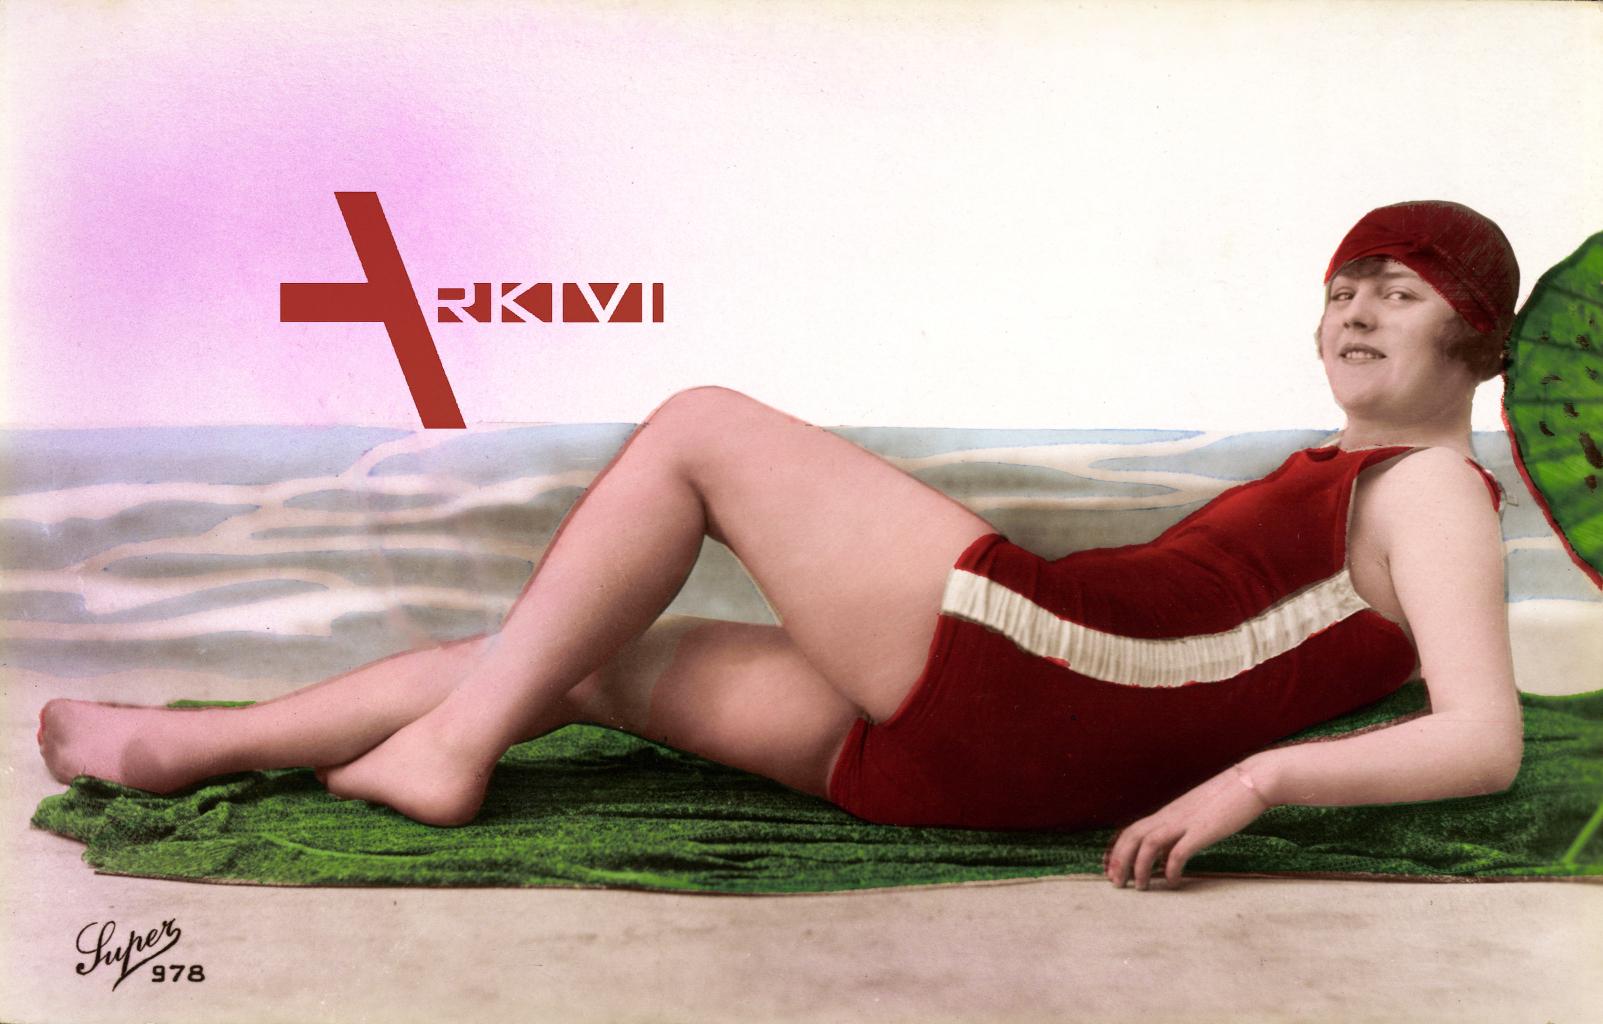 Frau in rotem Badeanzug am Strand, Sonnenschirm, Beine, Badekappe